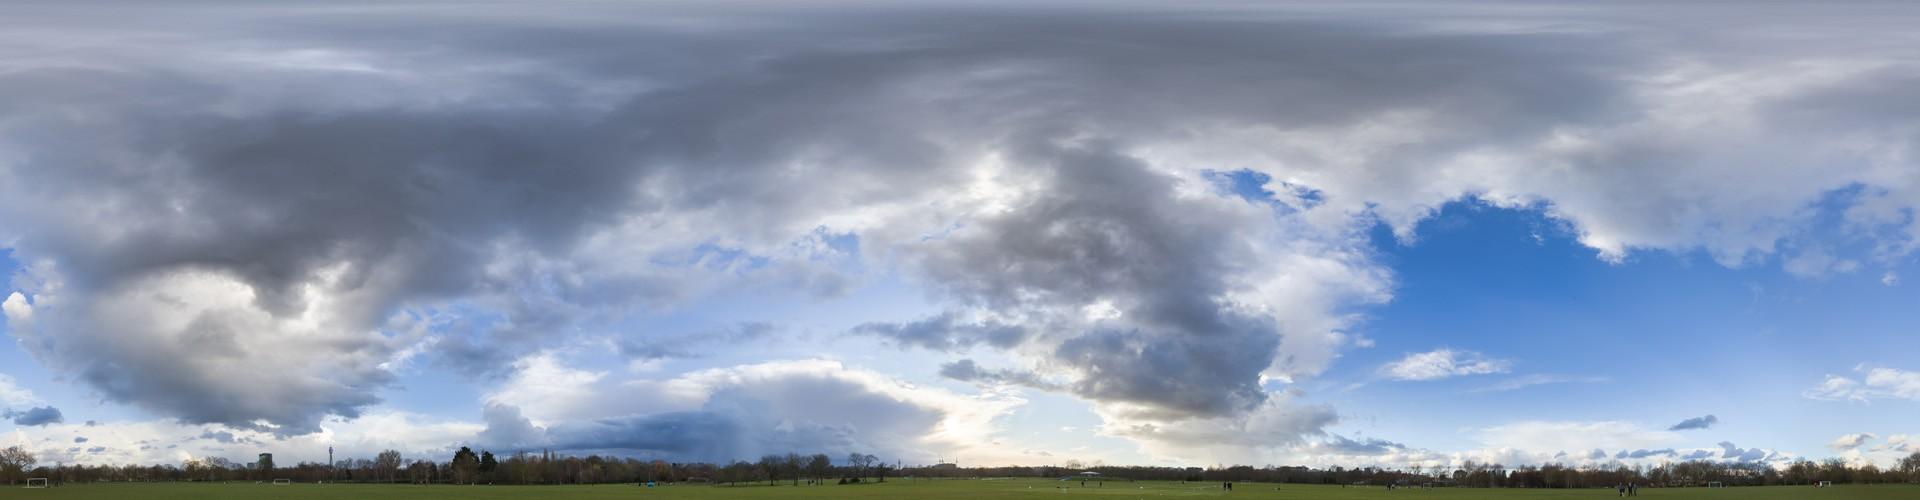 Rainy Clouds 3608 (30k) HDRI